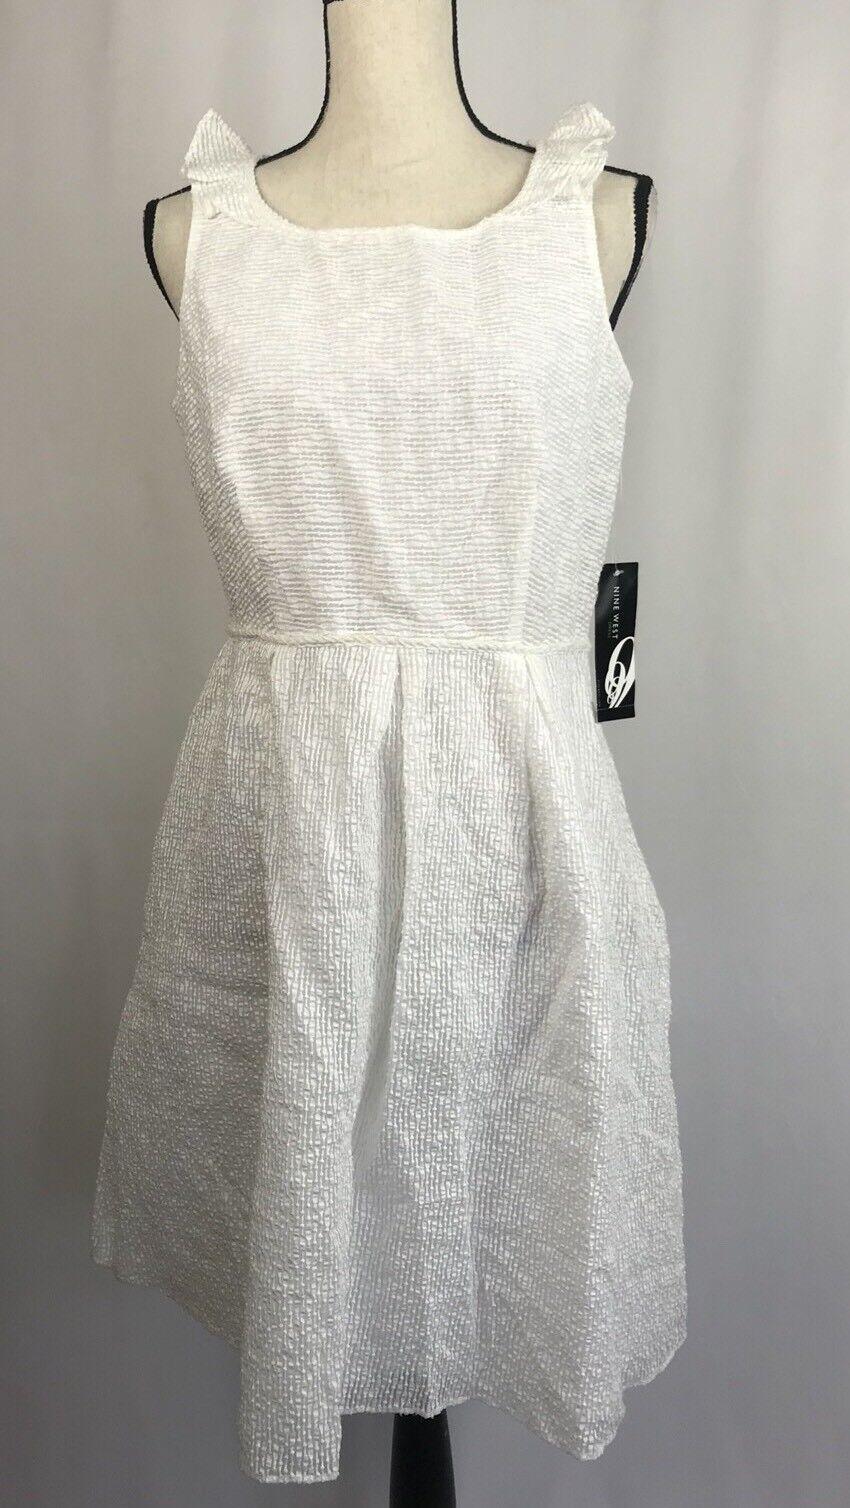 NINE WEST Woherren Dress Weiß Sun Dress Ruffle Größe 8 NWT retail AH